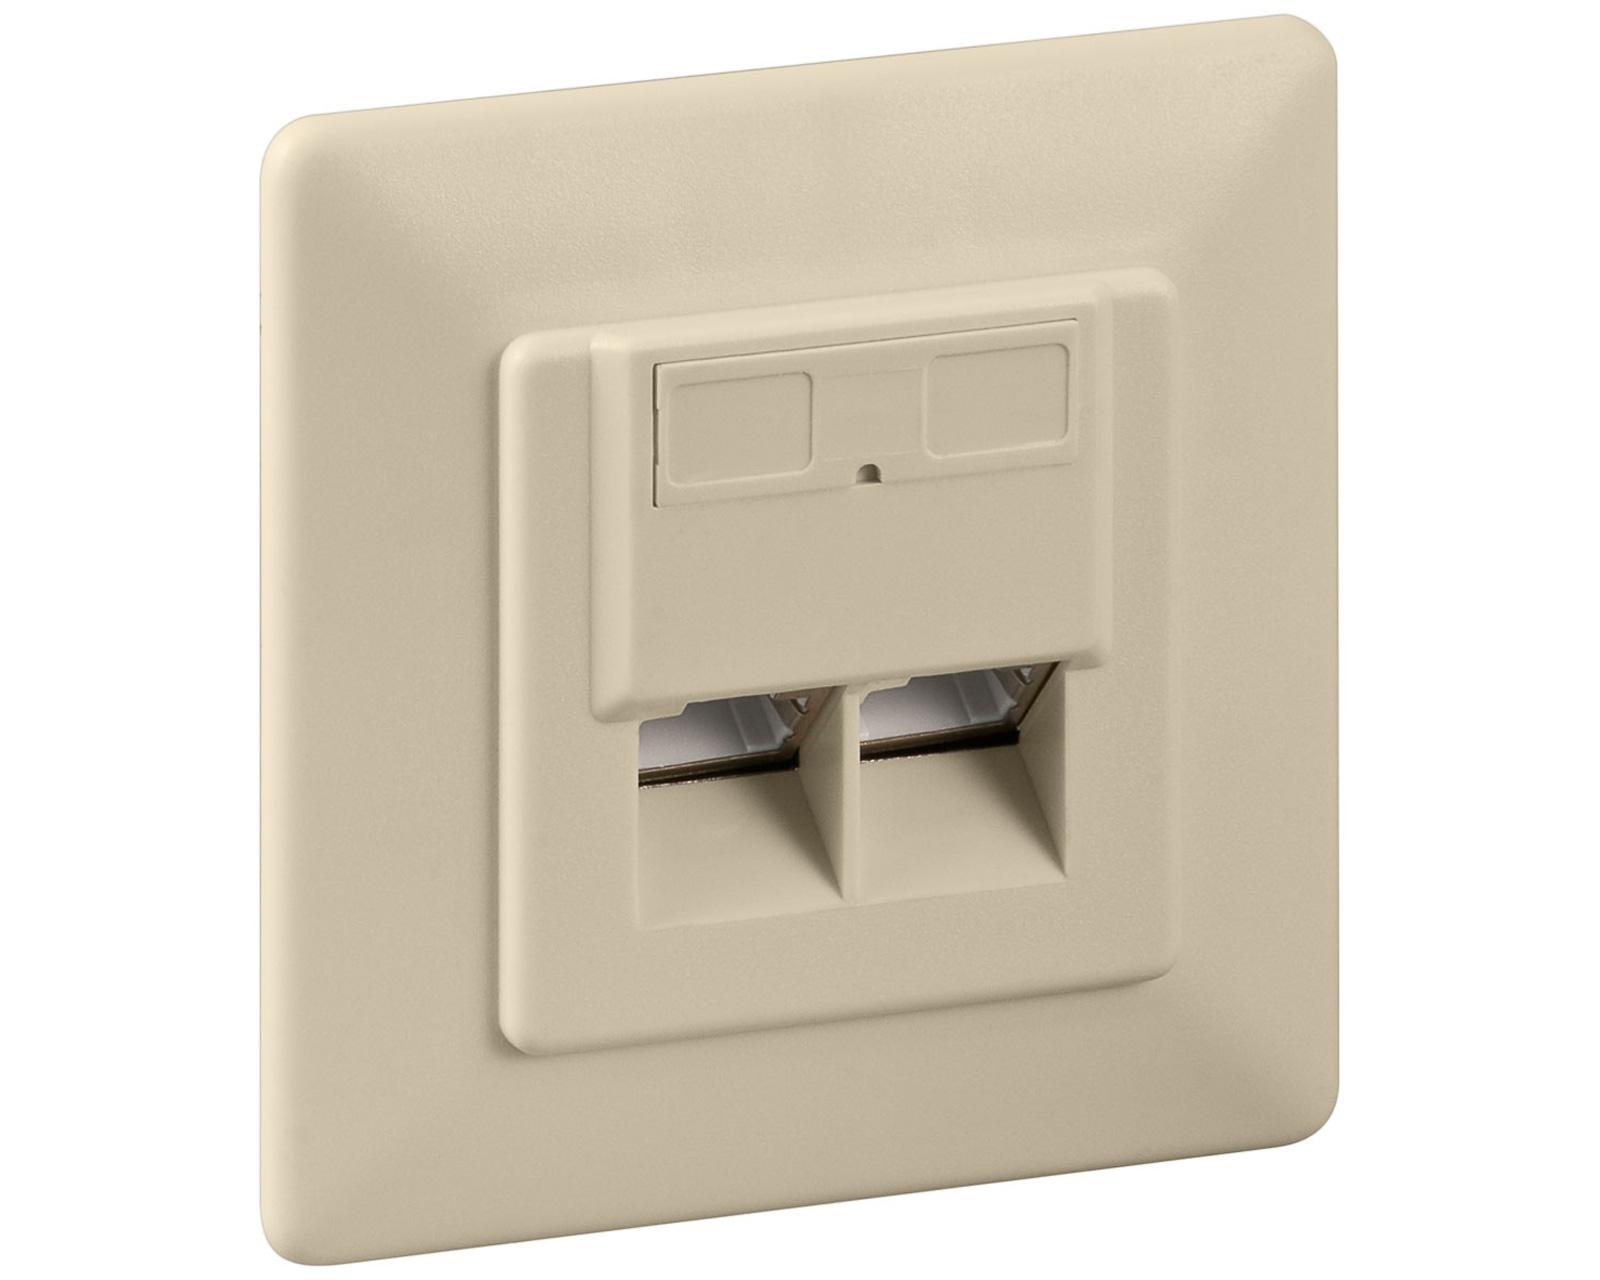 goobay cat 6 unterputz netzwerk anschlu dose 2x rj45 lsa. Black Bedroom Furniture Sets. Home Design Ideas